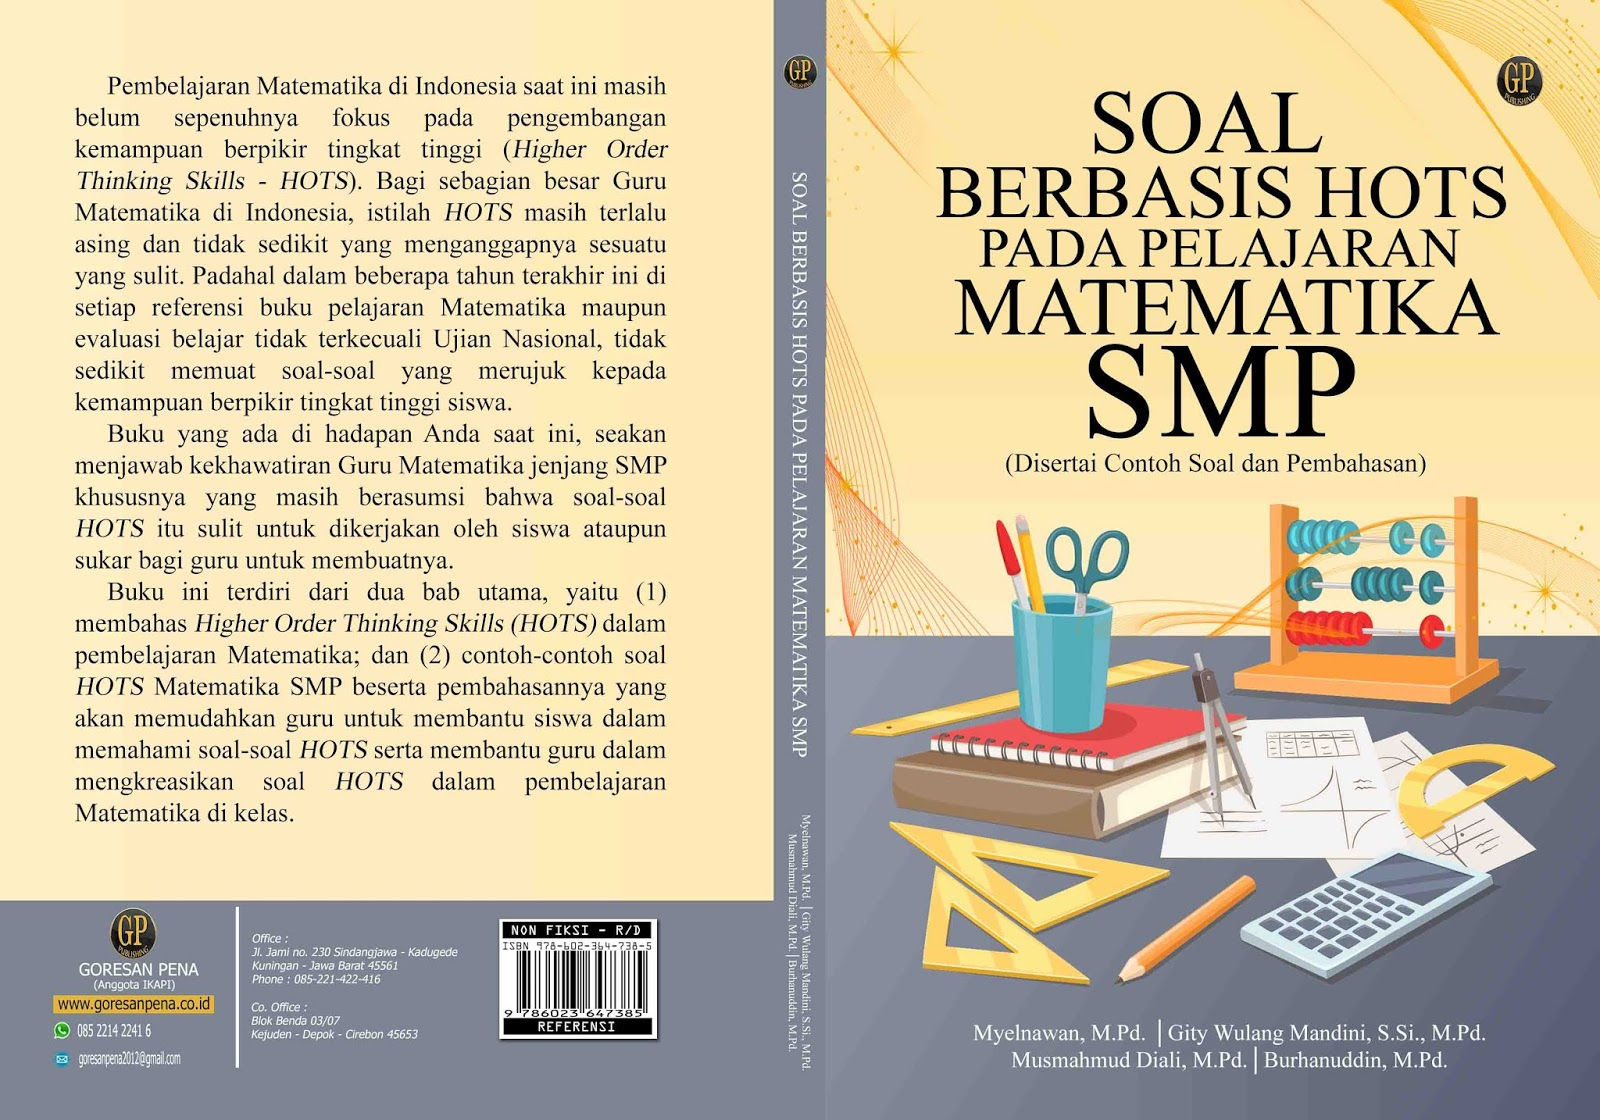 12/12/2018· soal hots matematika ke 1. Soal Berbasis Hots Pada Pembelajaran Matematika Smp Penerbit Goresan Pena Anggota Ikapi